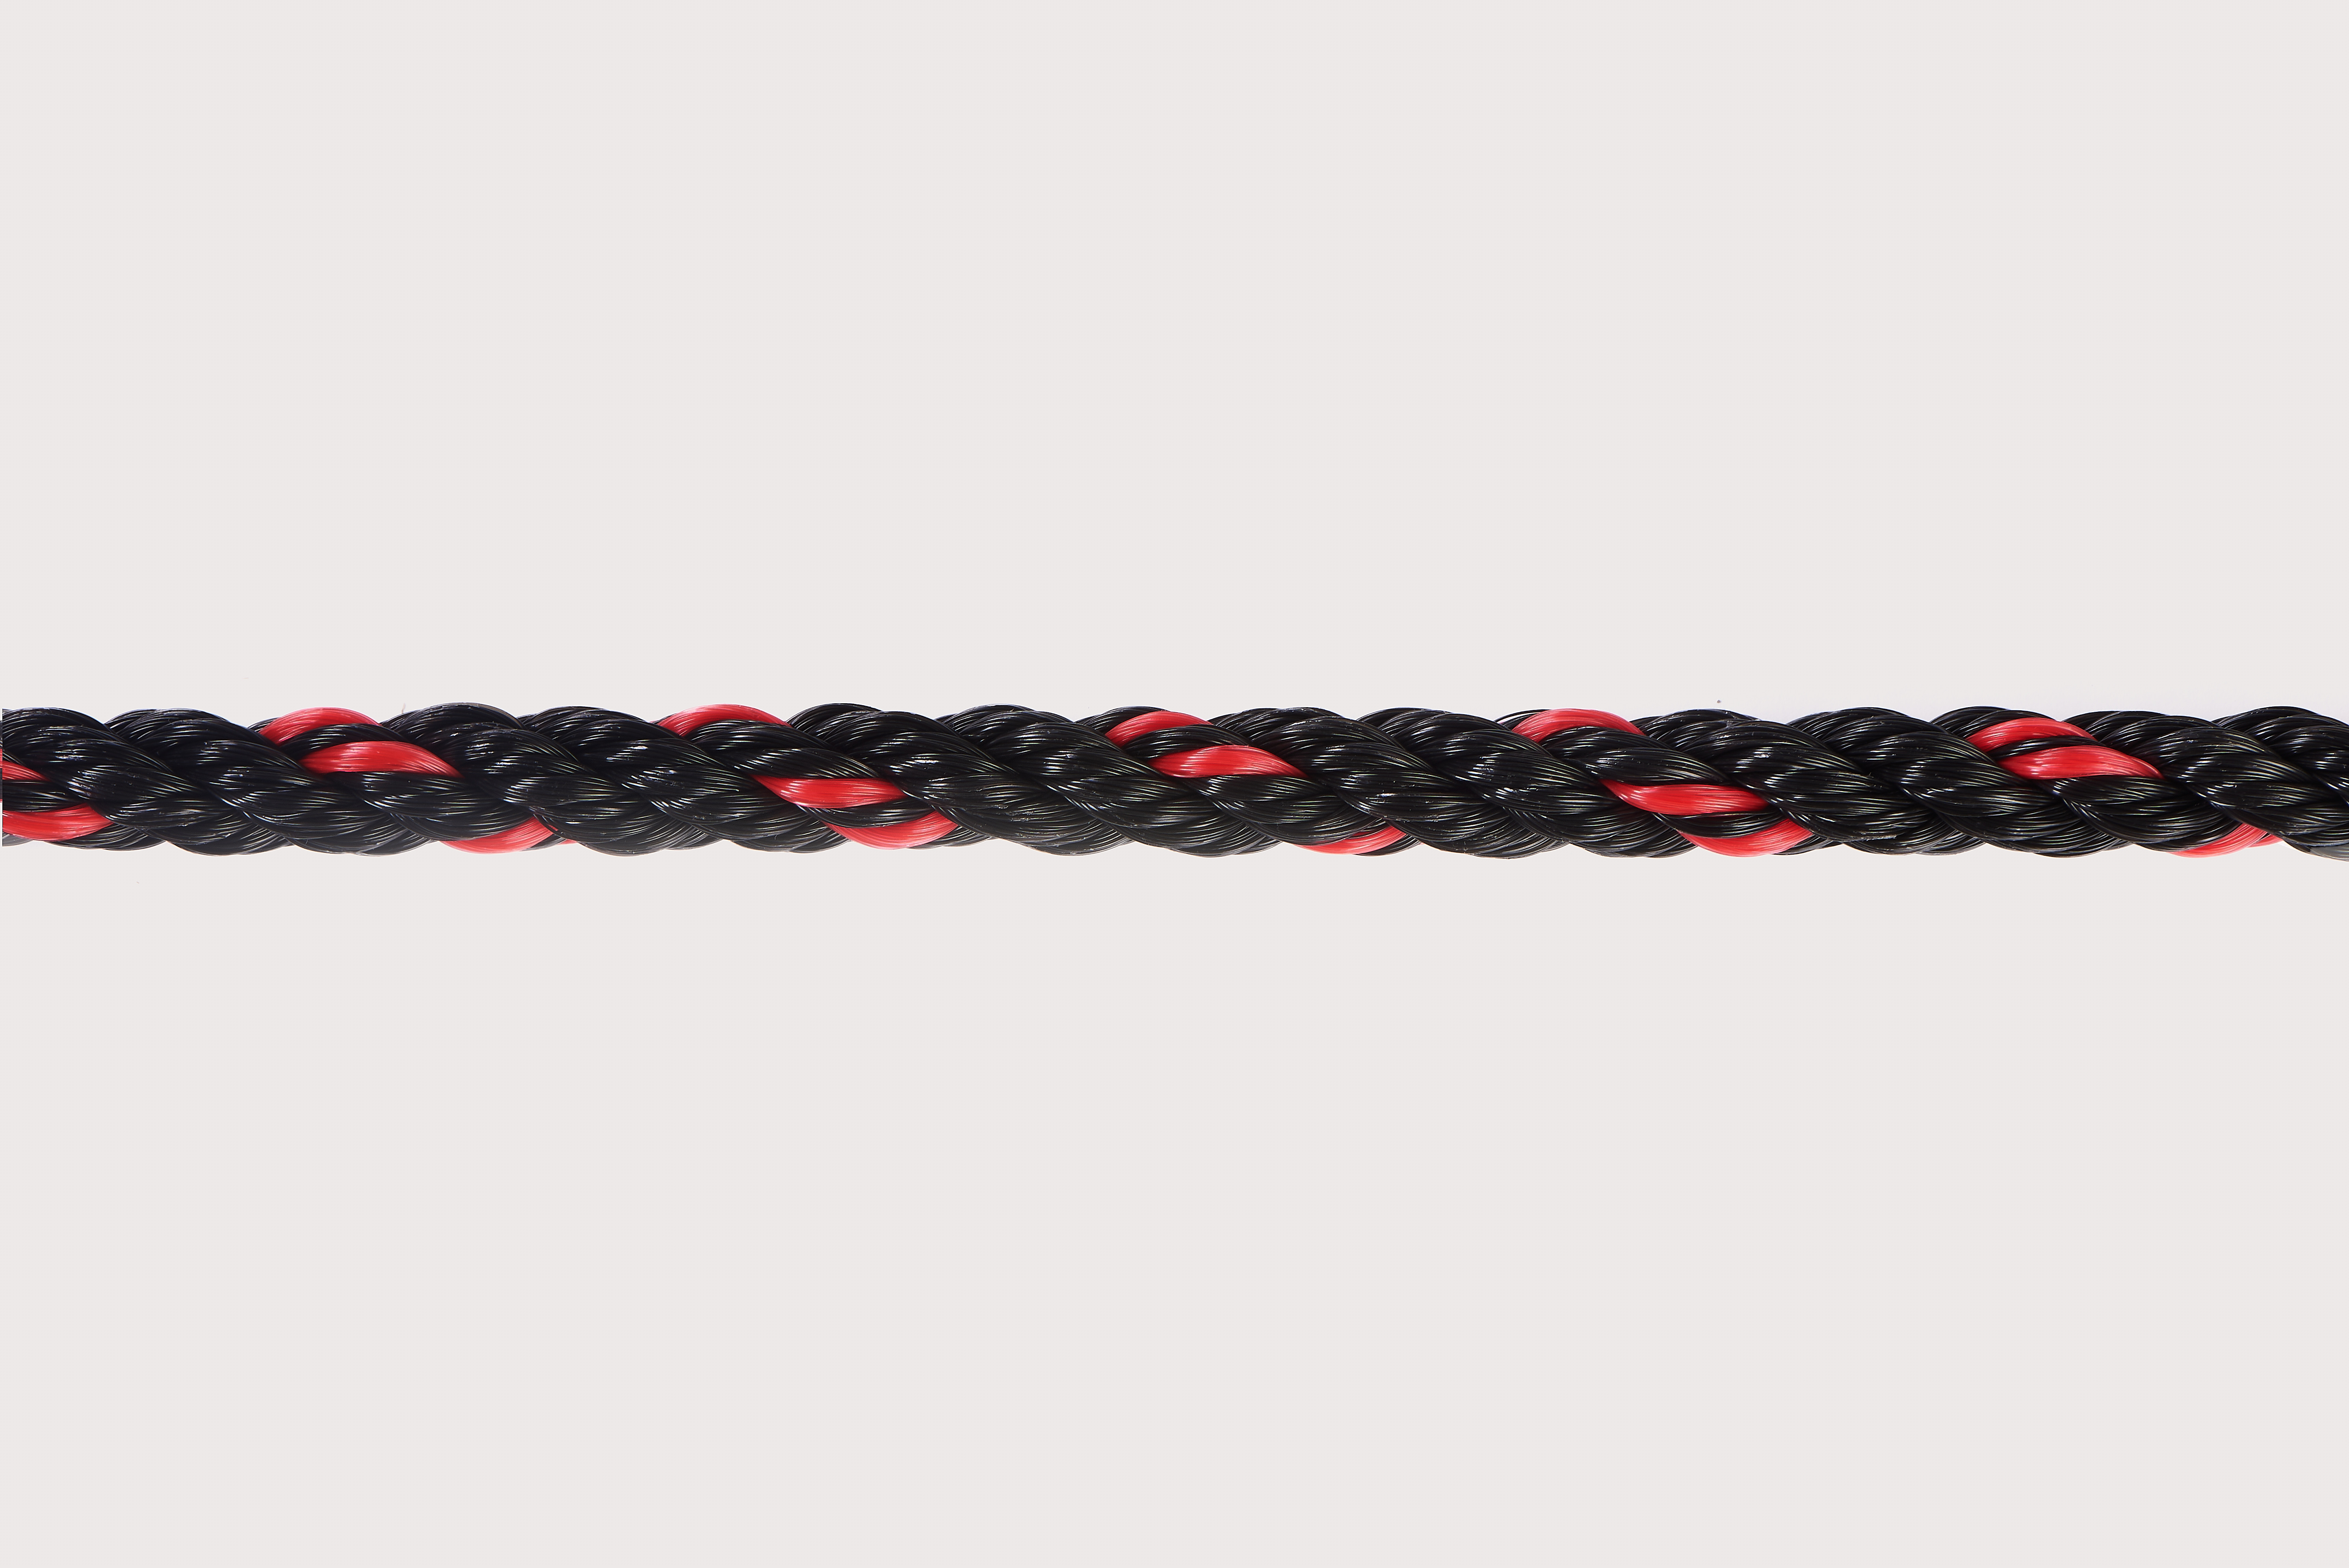 Orion-Cordage-3-Strand Monofilament Polypropylene-Black I Red-Horizontal149.jpg